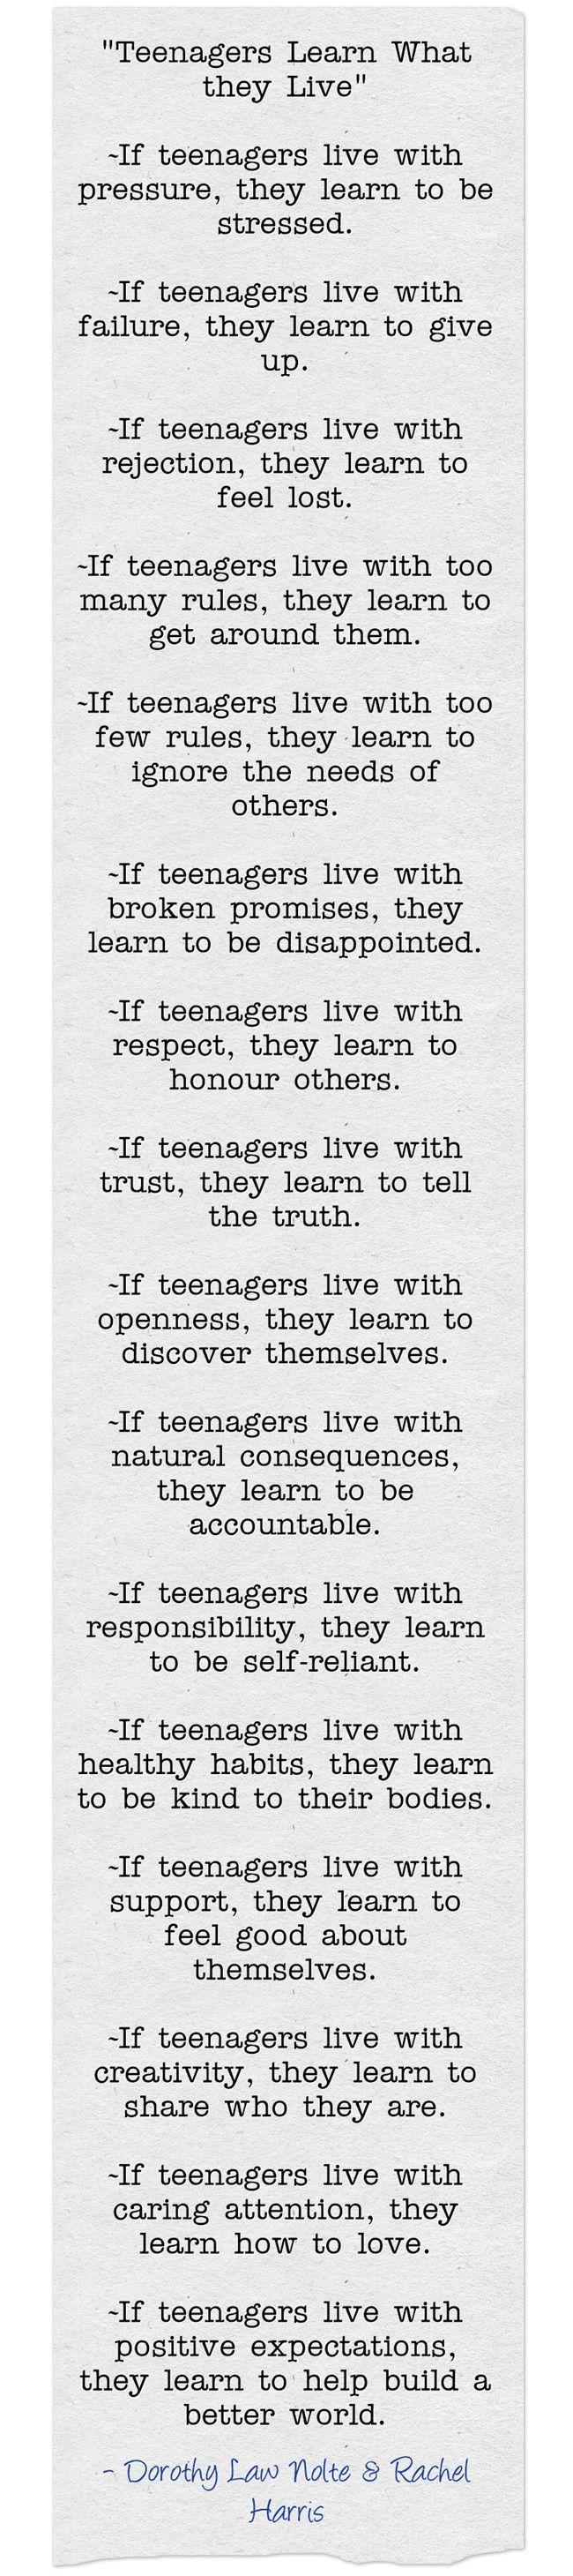 Teen advice poem